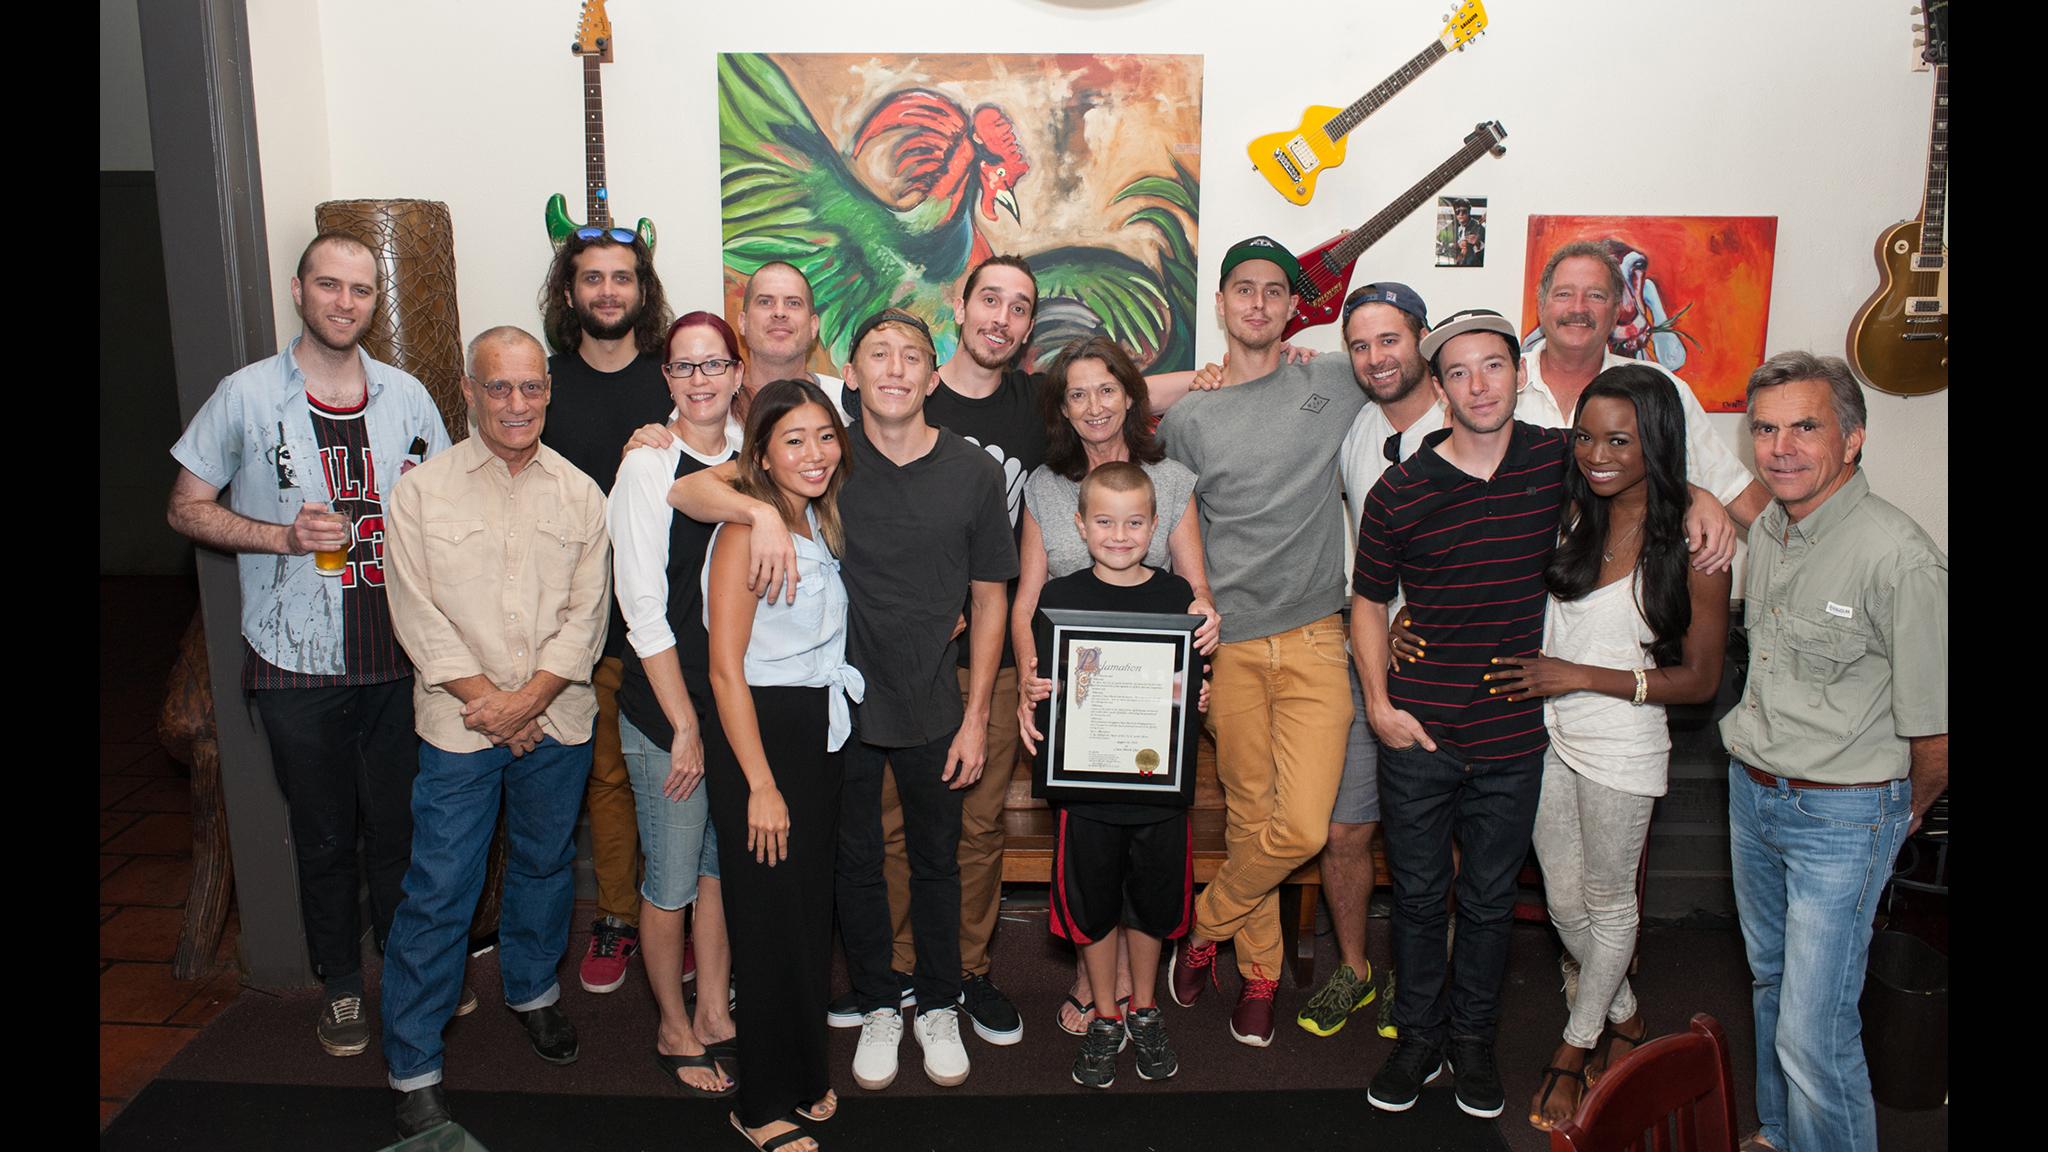 Empire BMX crew, family and friends